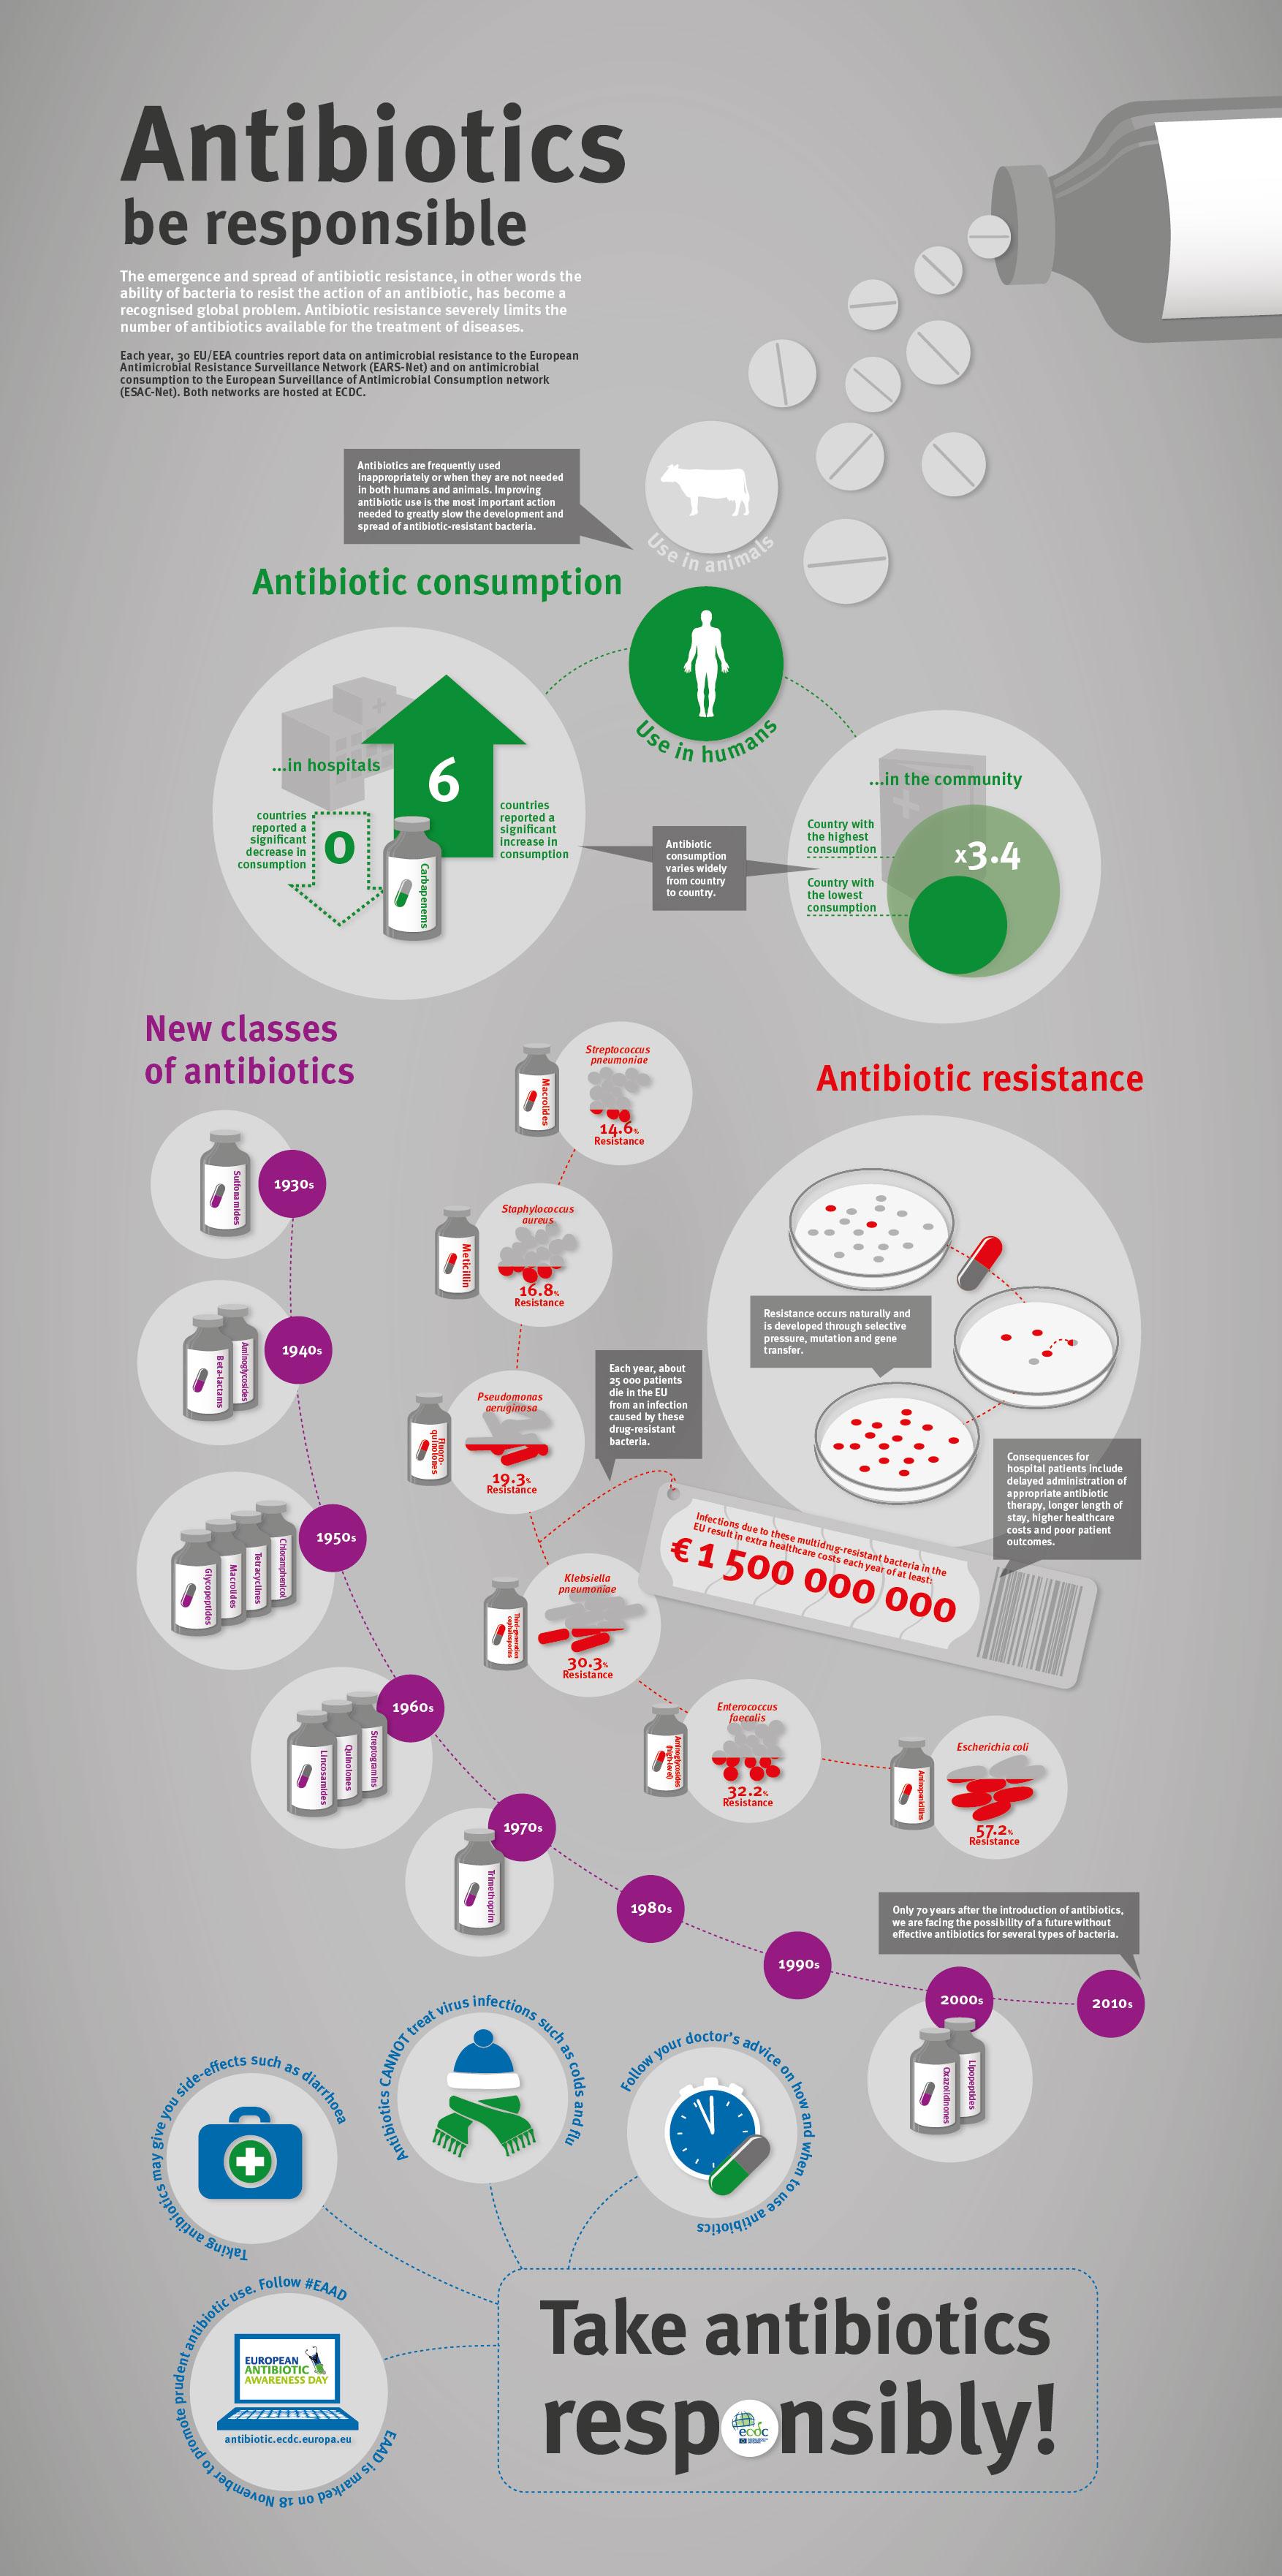 Responsible use of antibiotics